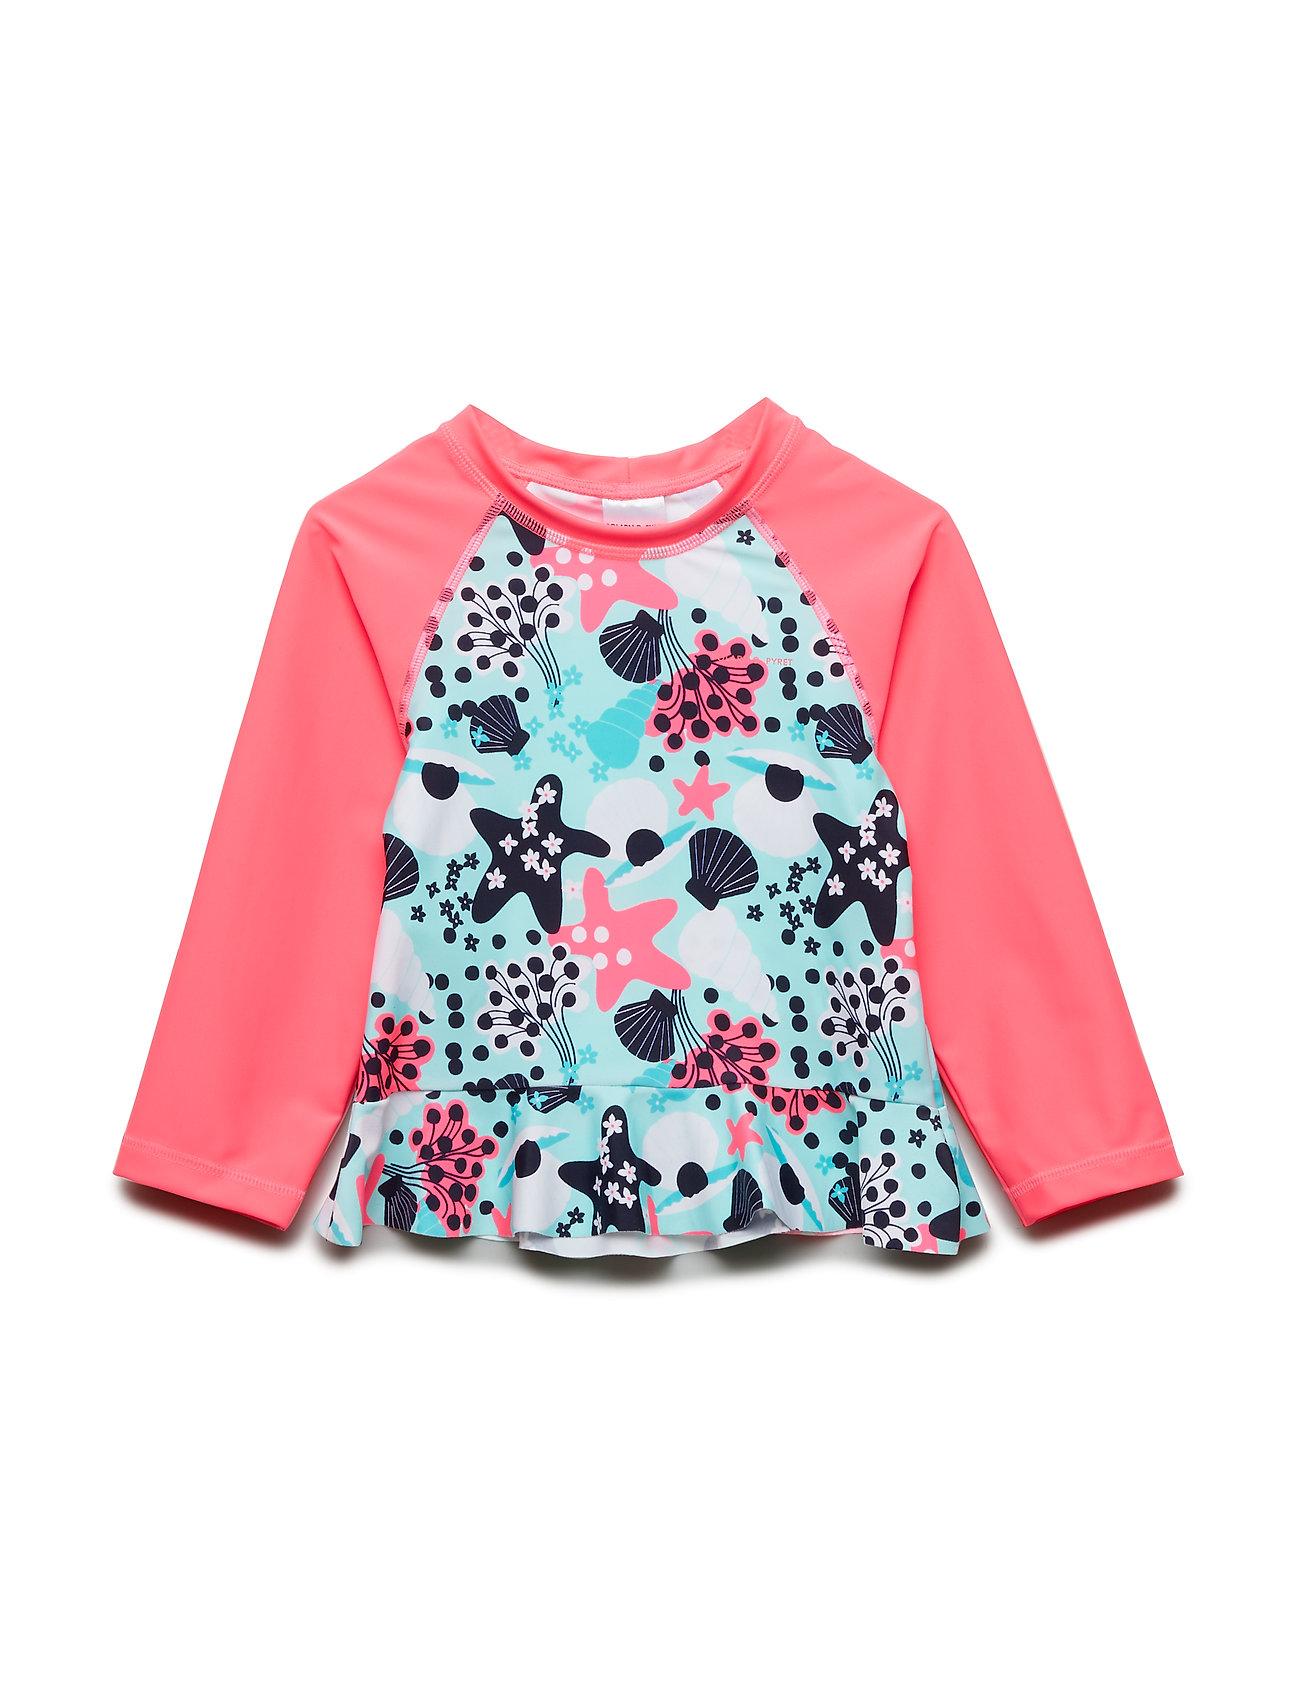 Polarn O. Pyret Swimwear Top l/s UPF AOP Preschool - FANDANGO PINK